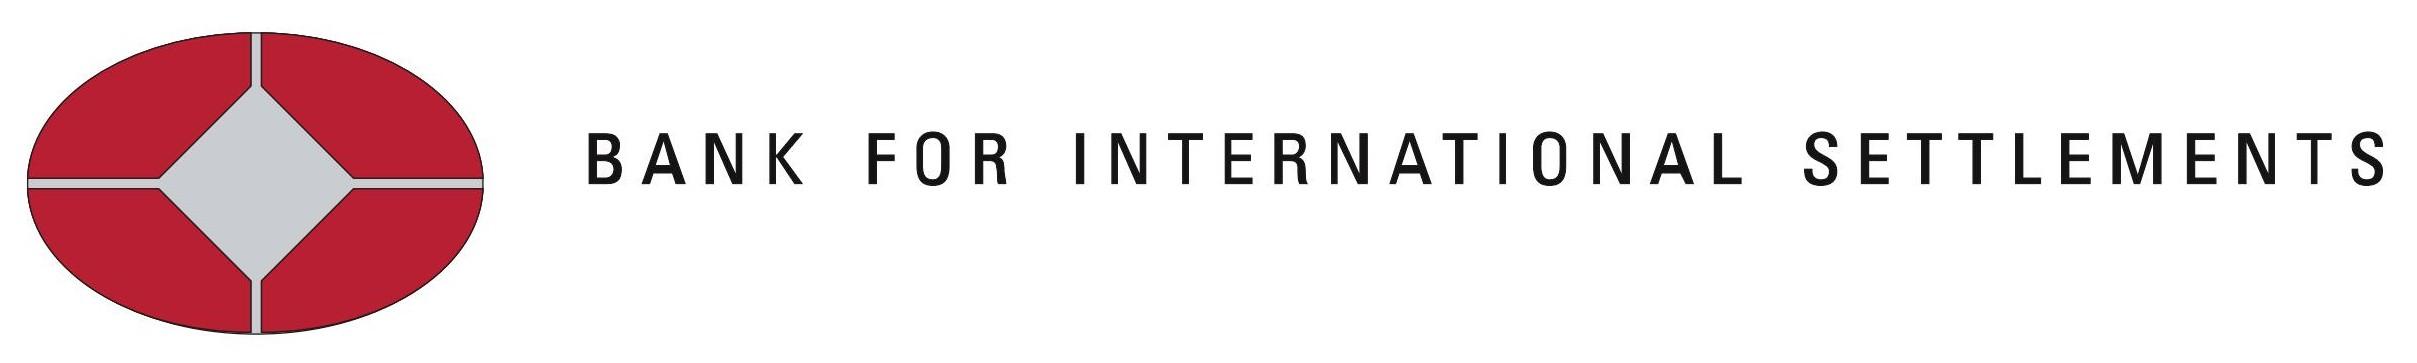 BIS - Bank for International Settlements